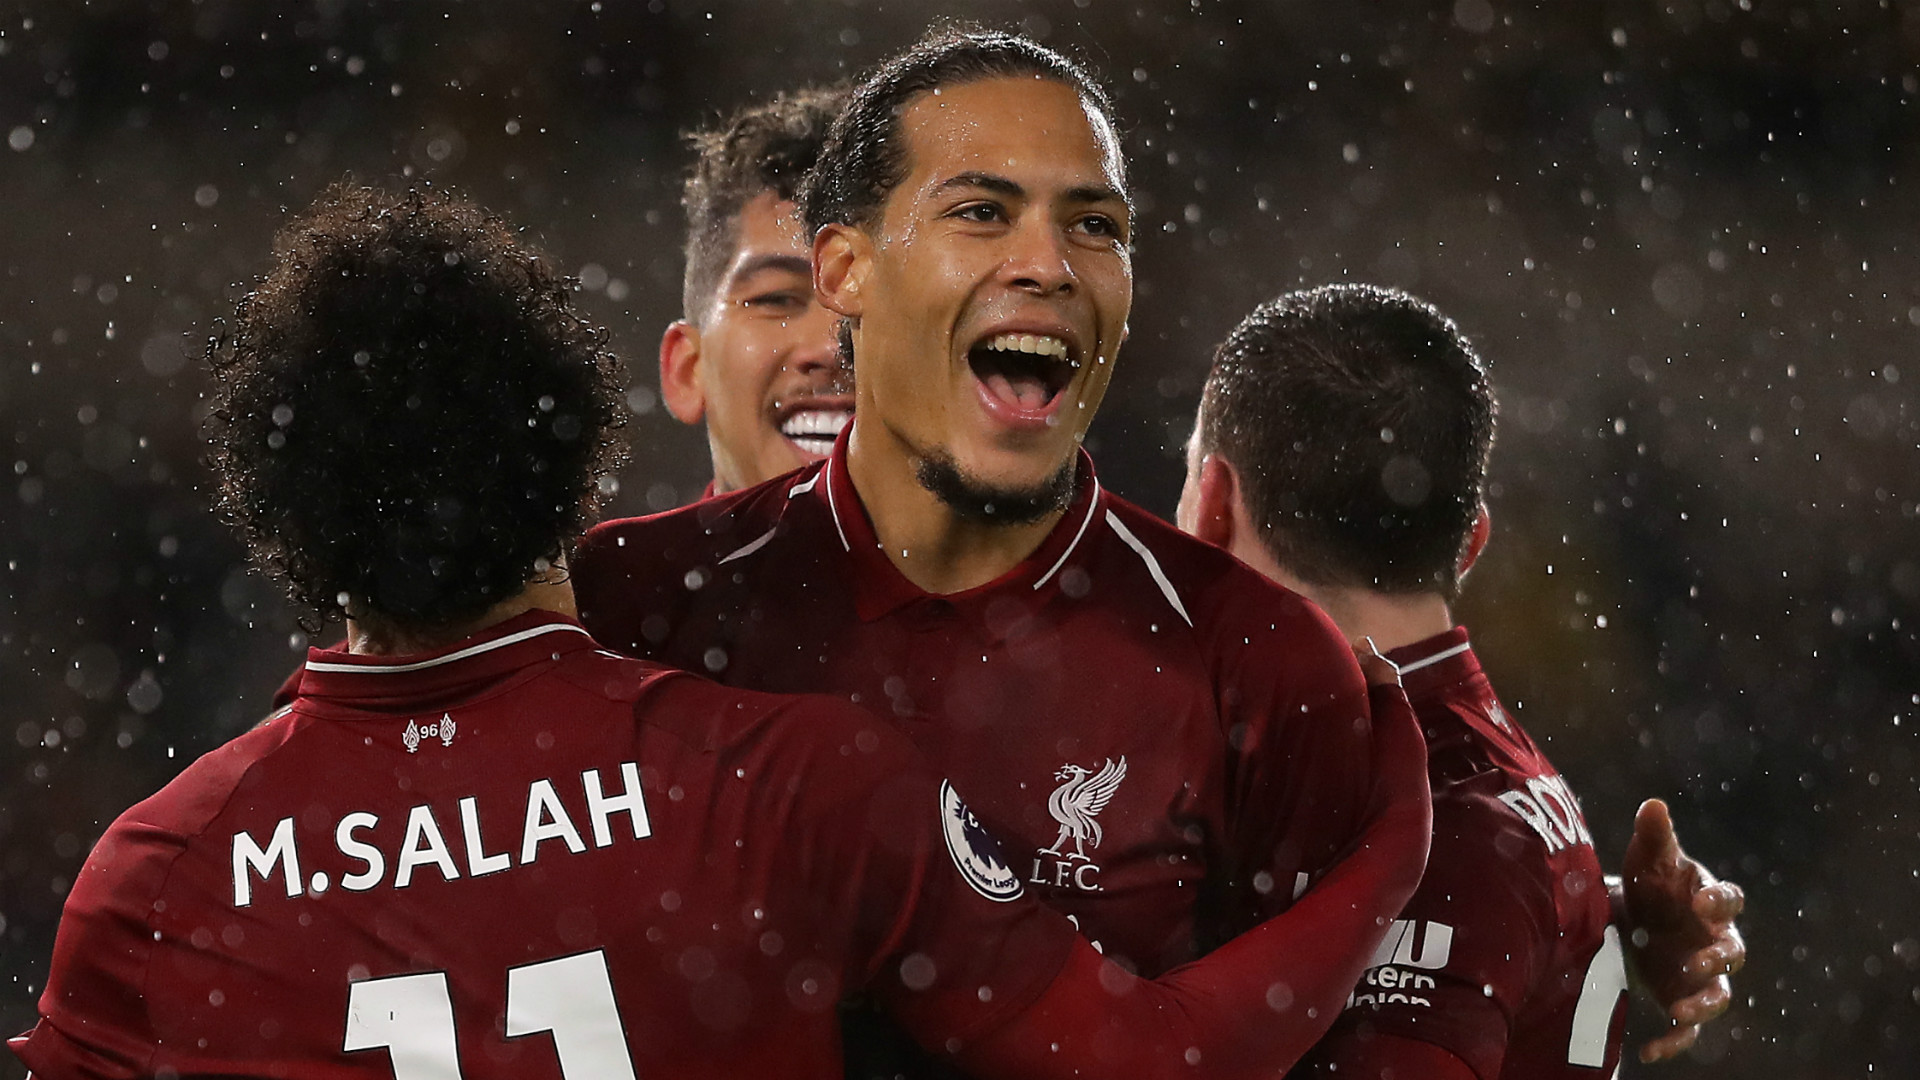 Liverpool News: Great Defender Virgil Van Dijk Brings Out